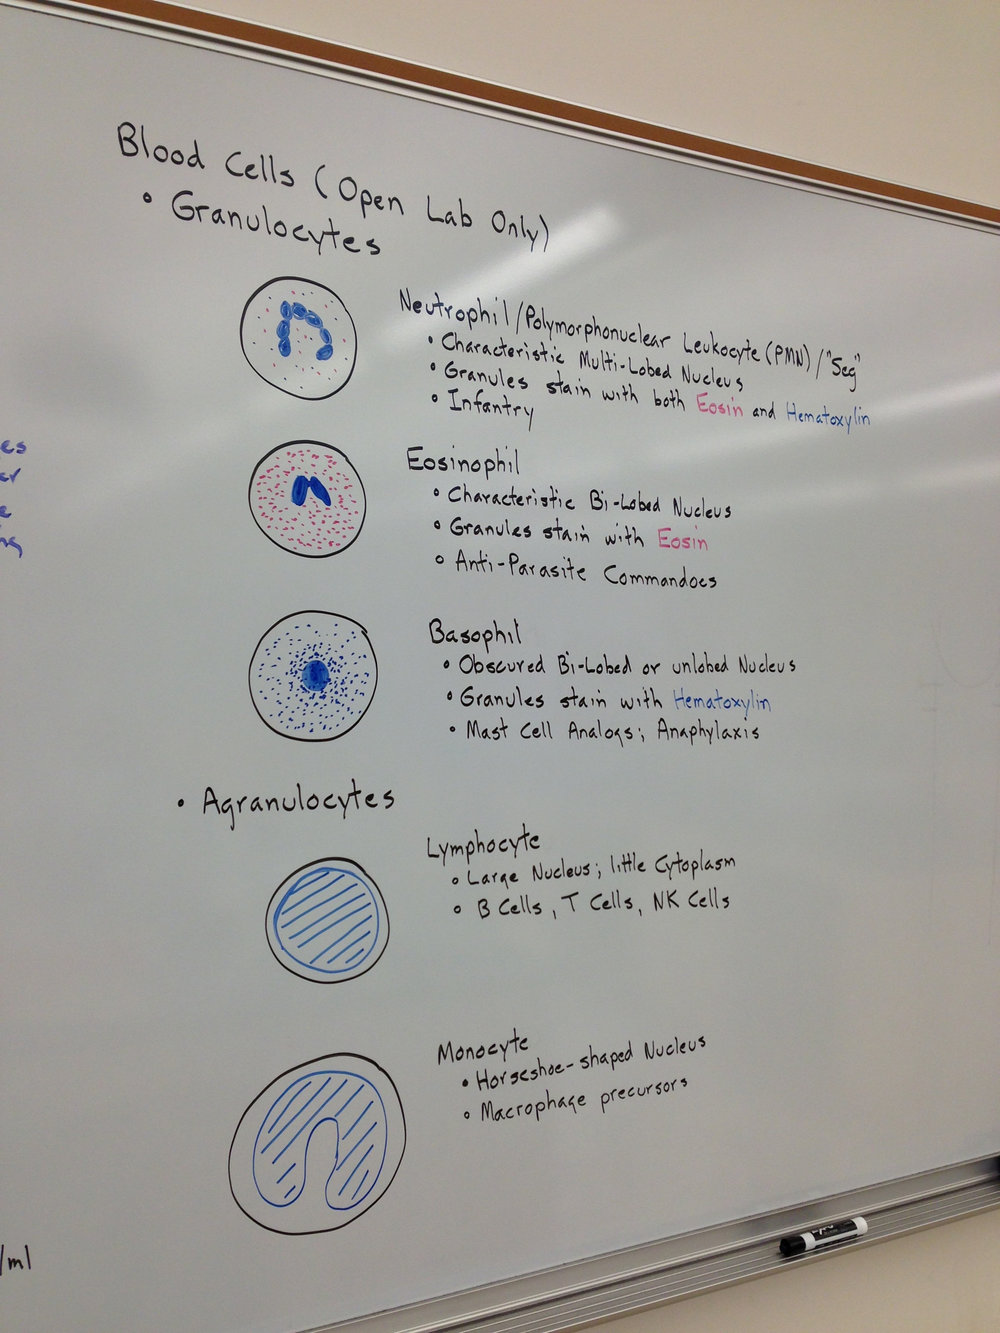 Microbiology laboratory Northern California University in Davis